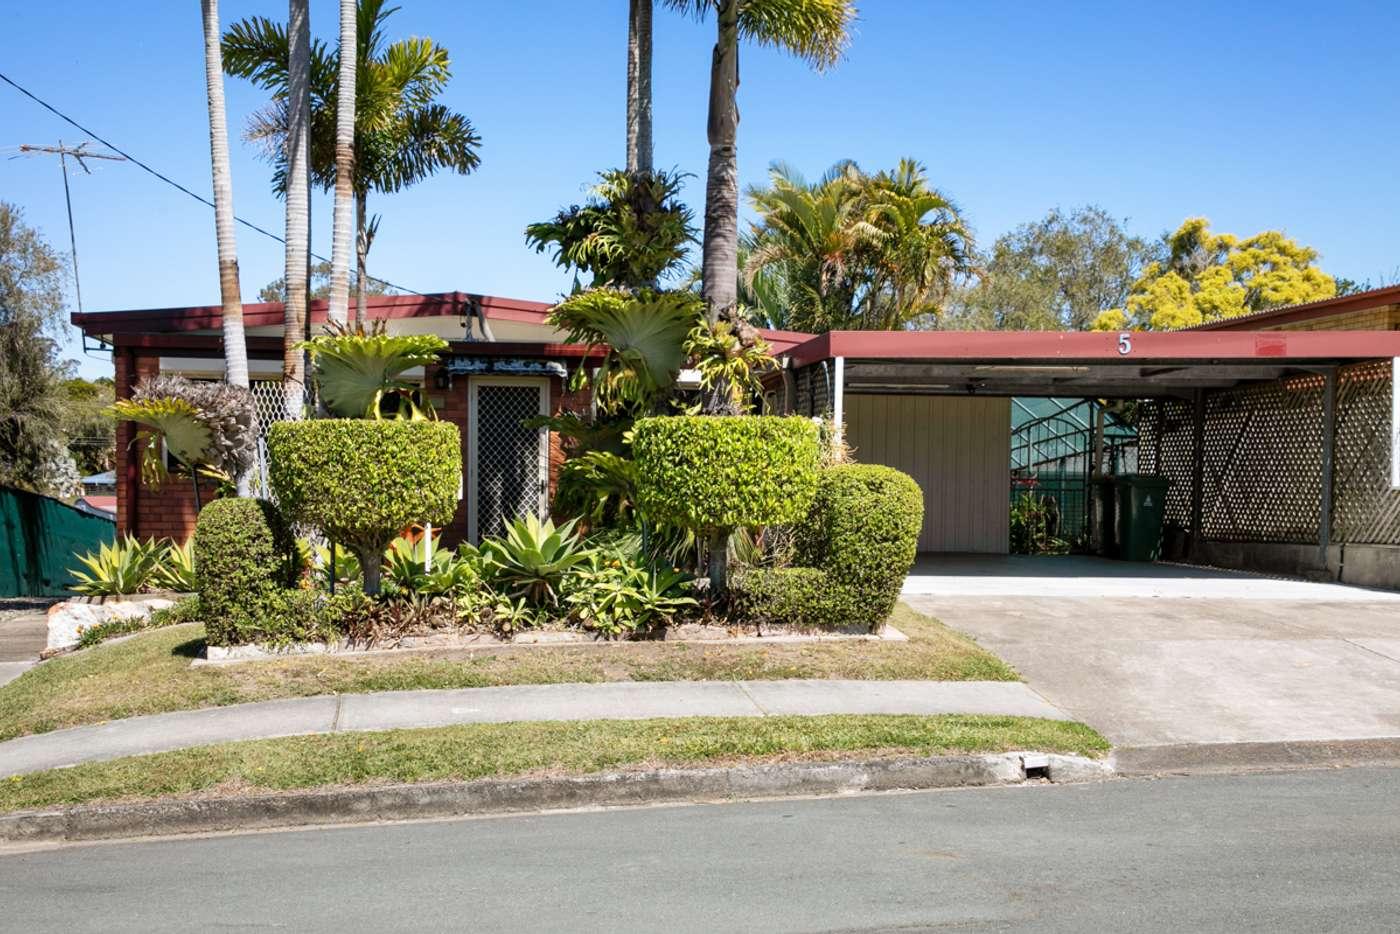 Main view of Homely house listing, 5 Yanderra Avenue, Arana Hills QLD 4054